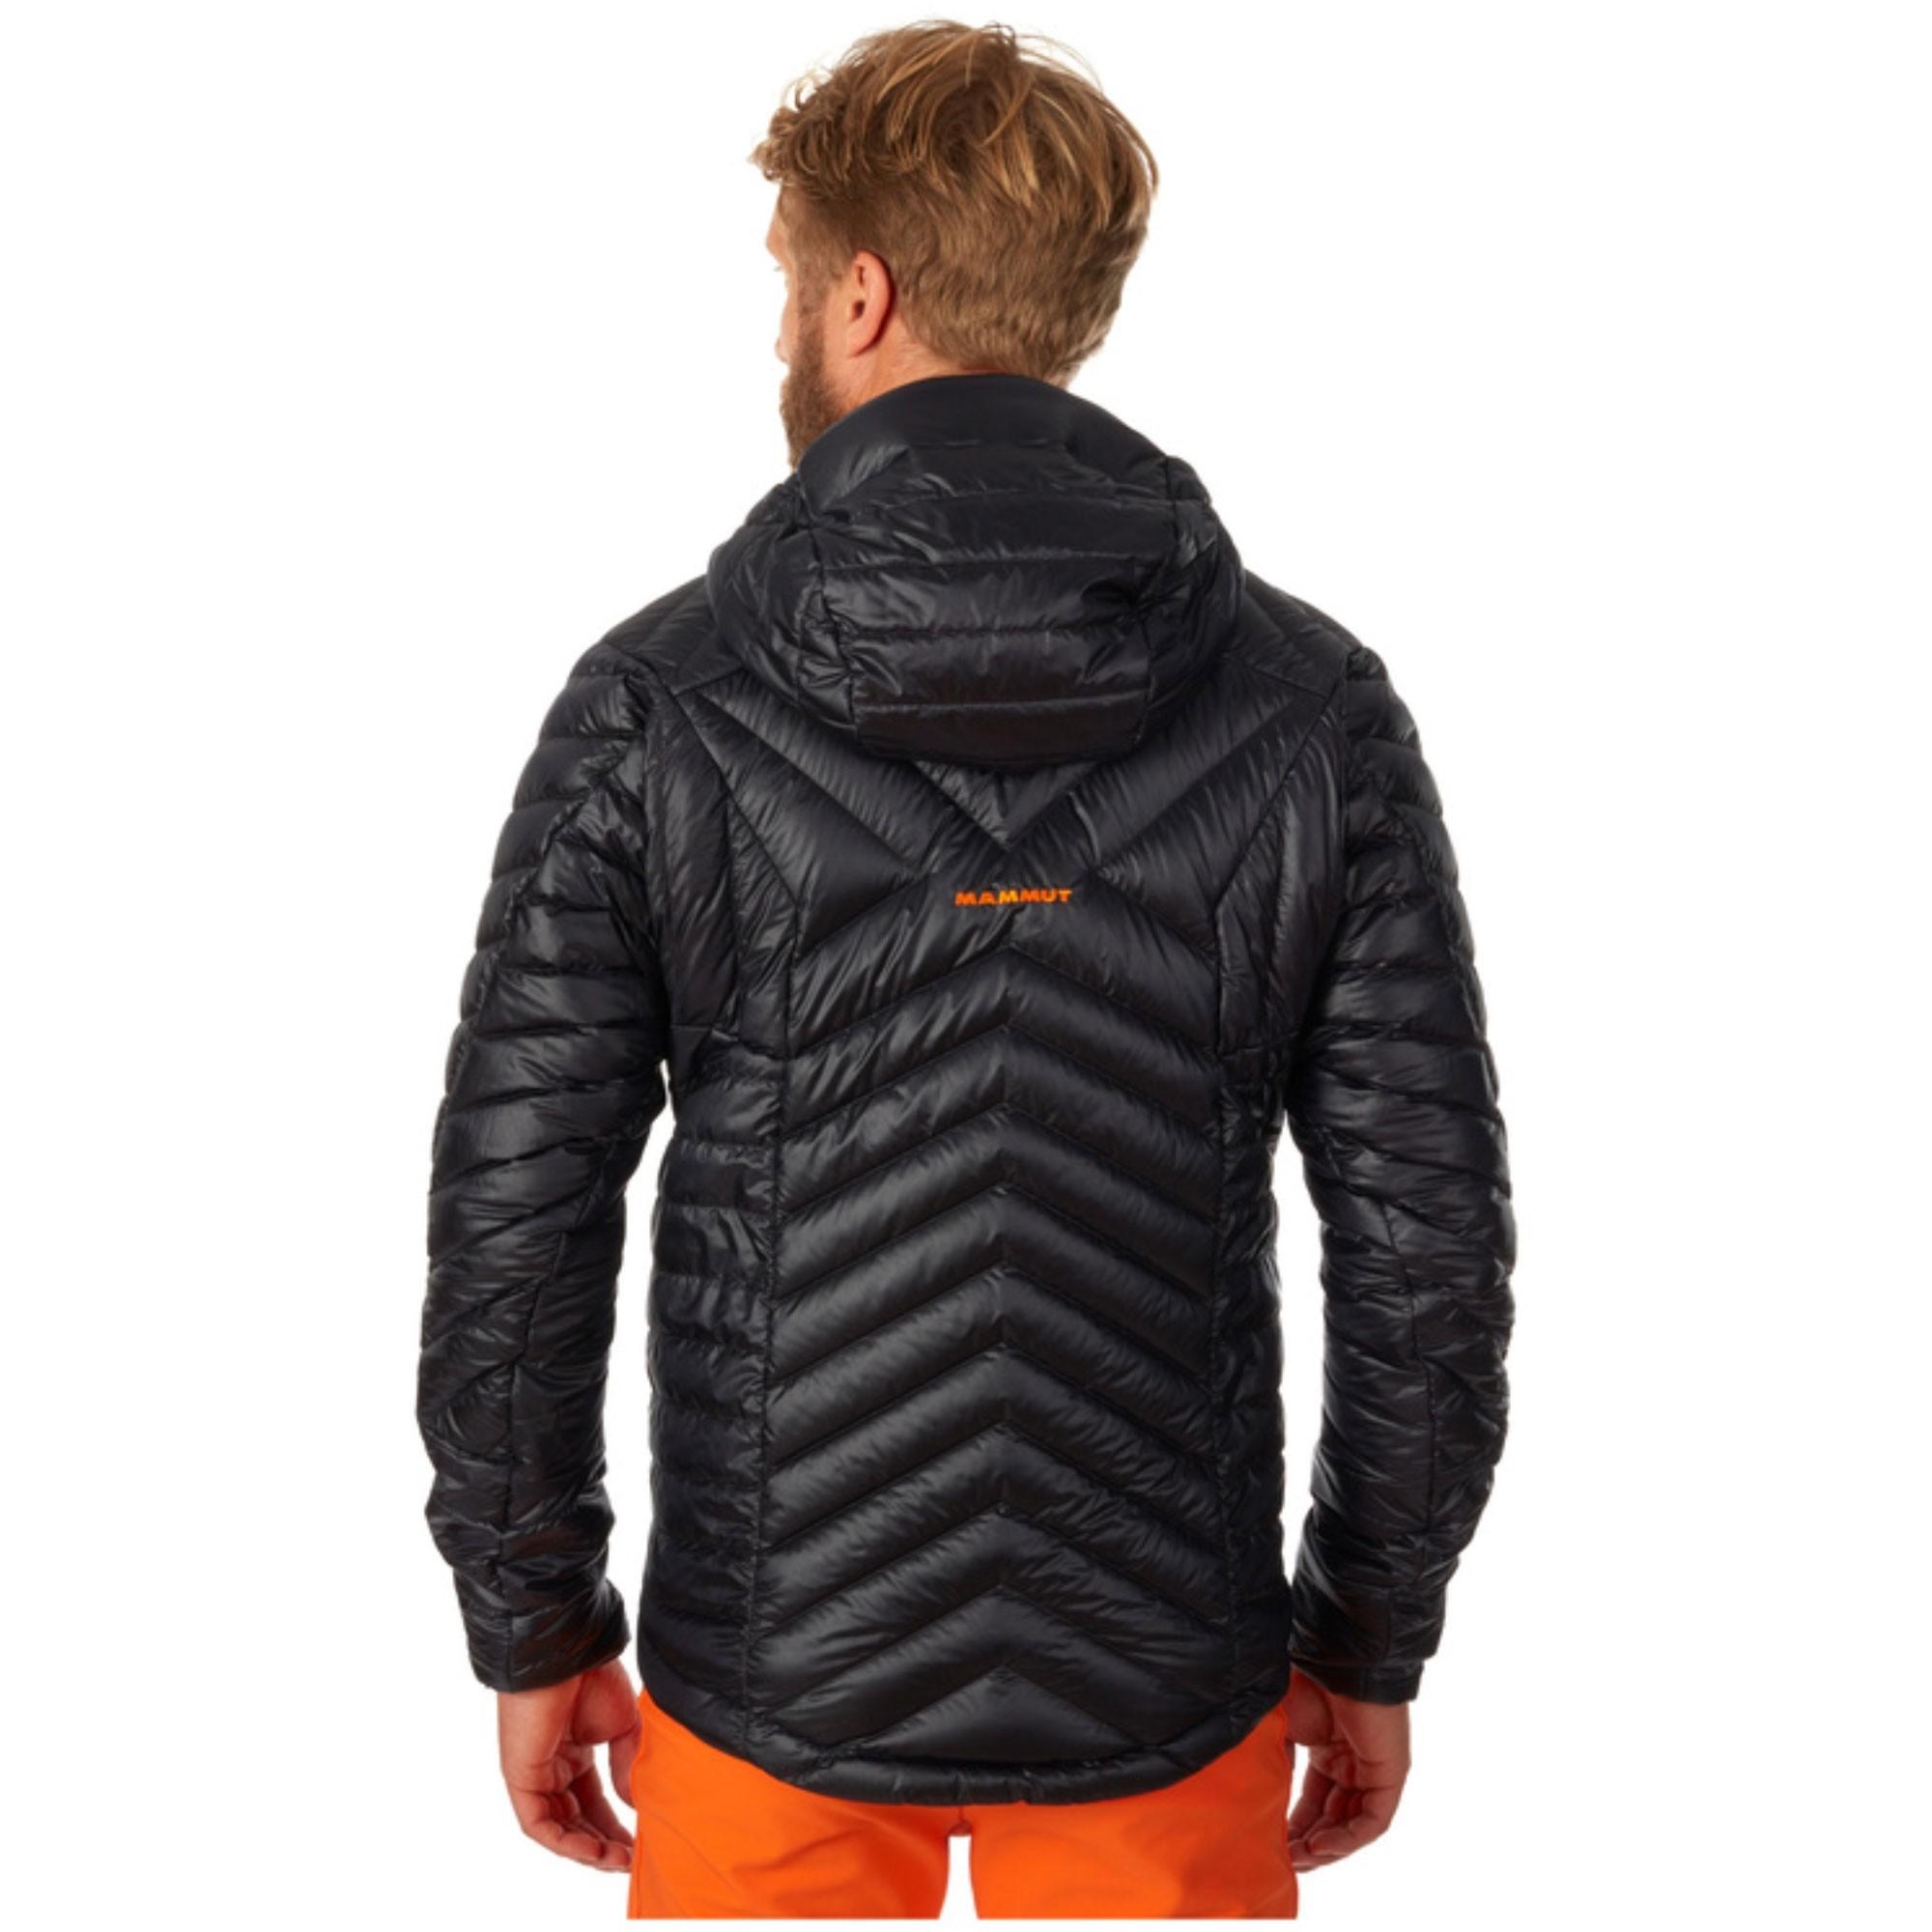 Mammut Eiger Extreme Eigerjoch Advanced IN Hooded Jacket - Night